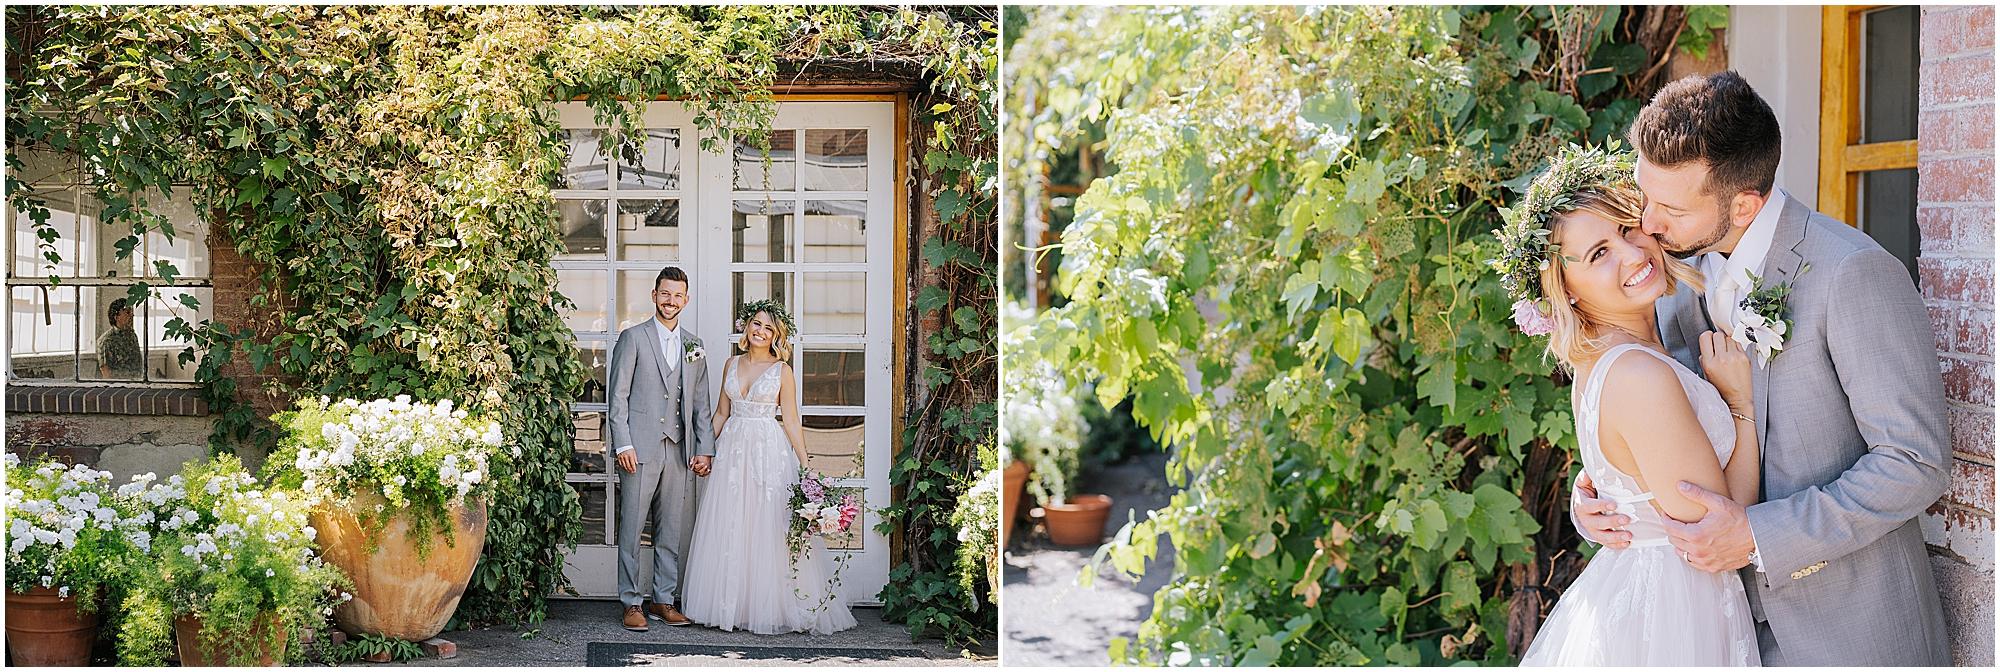 Blanc Denver Wedding Photography